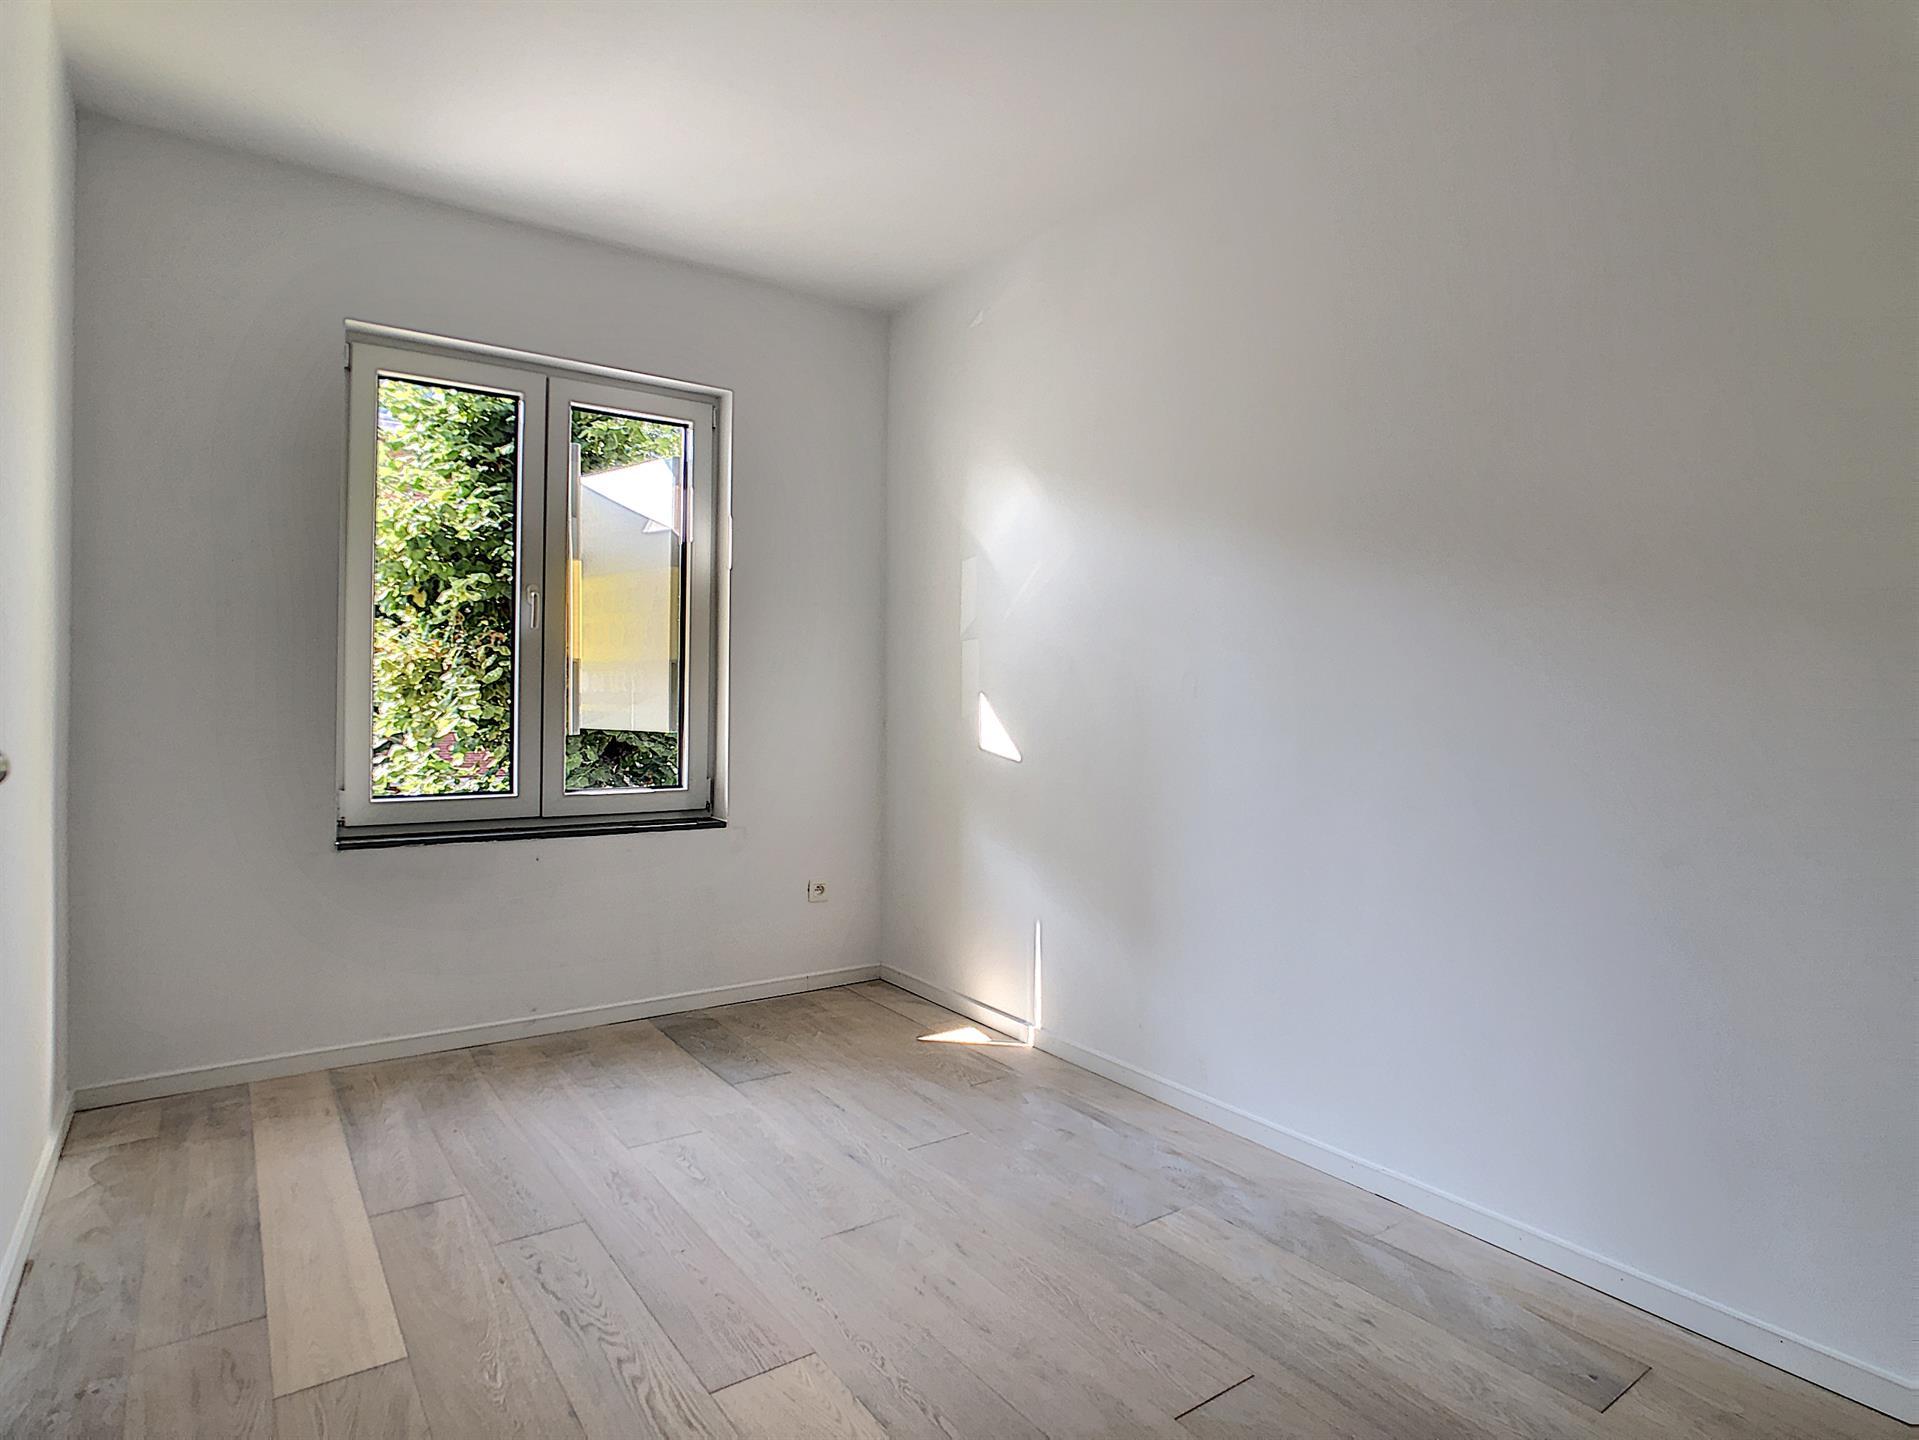 Appartement - Anderlecht - #4252375-7